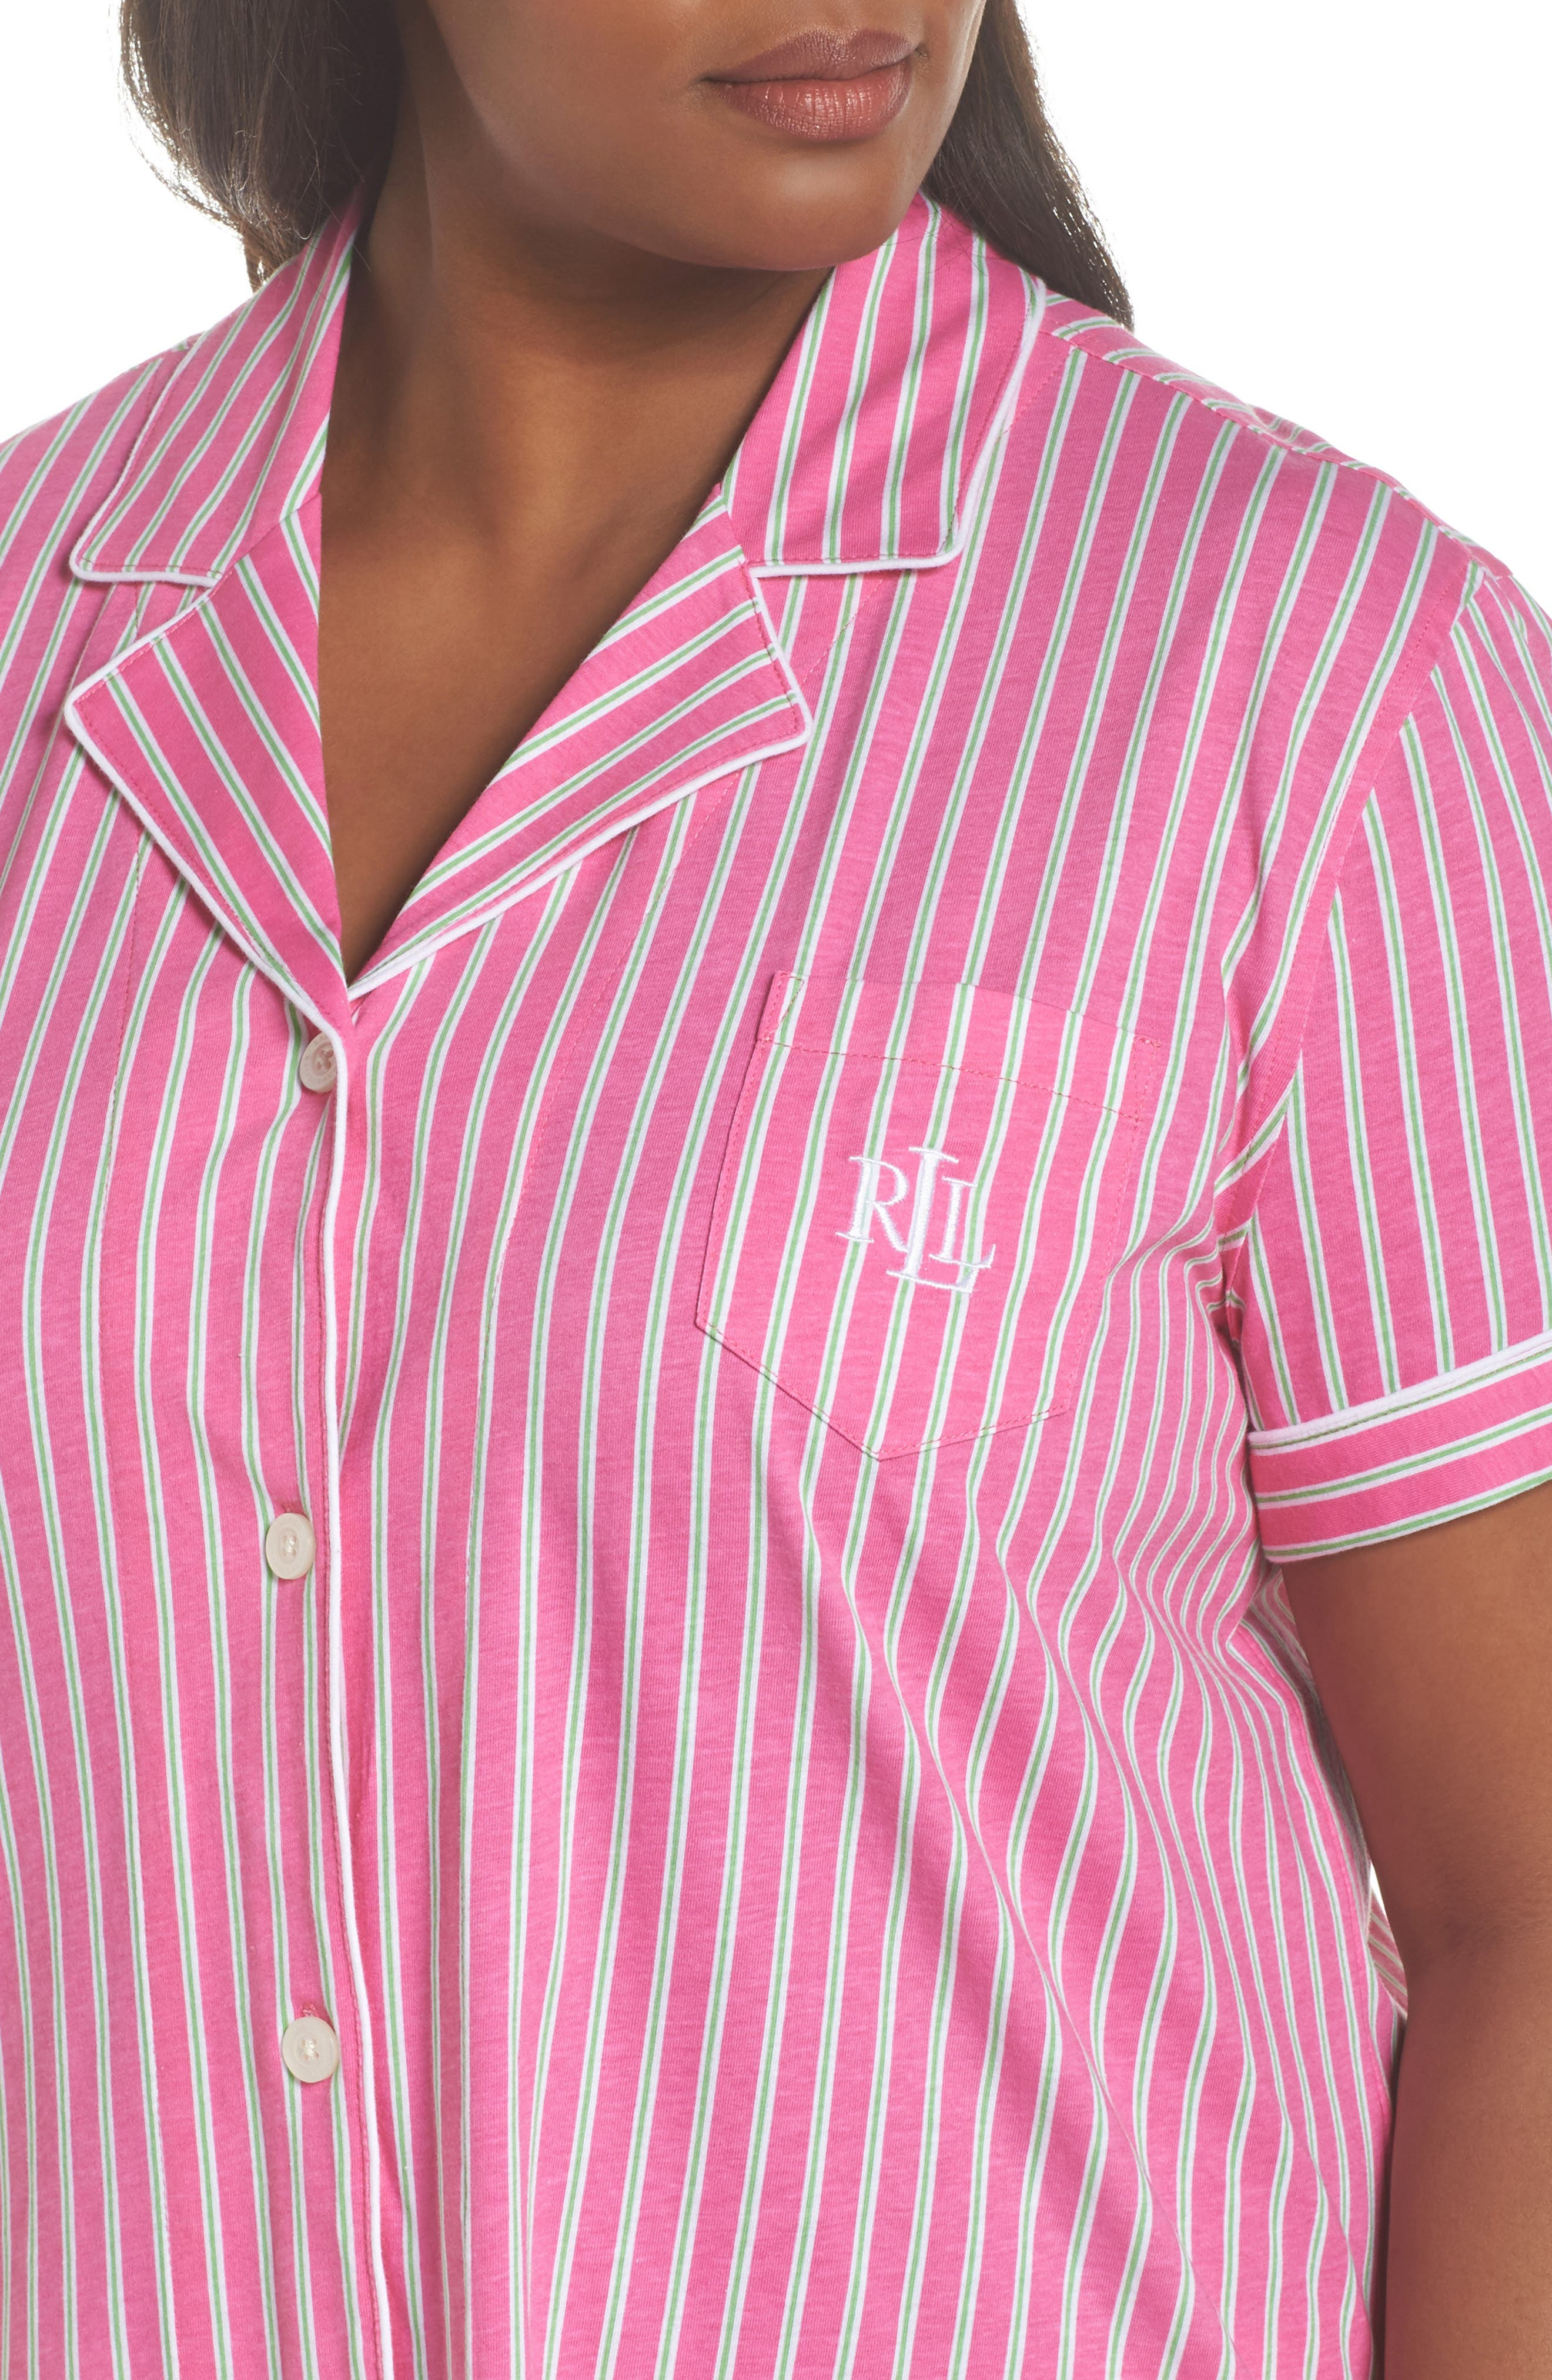 Bermuda Pajamas,                             Alternate thumbnail 5, color,                             Pink Stripe